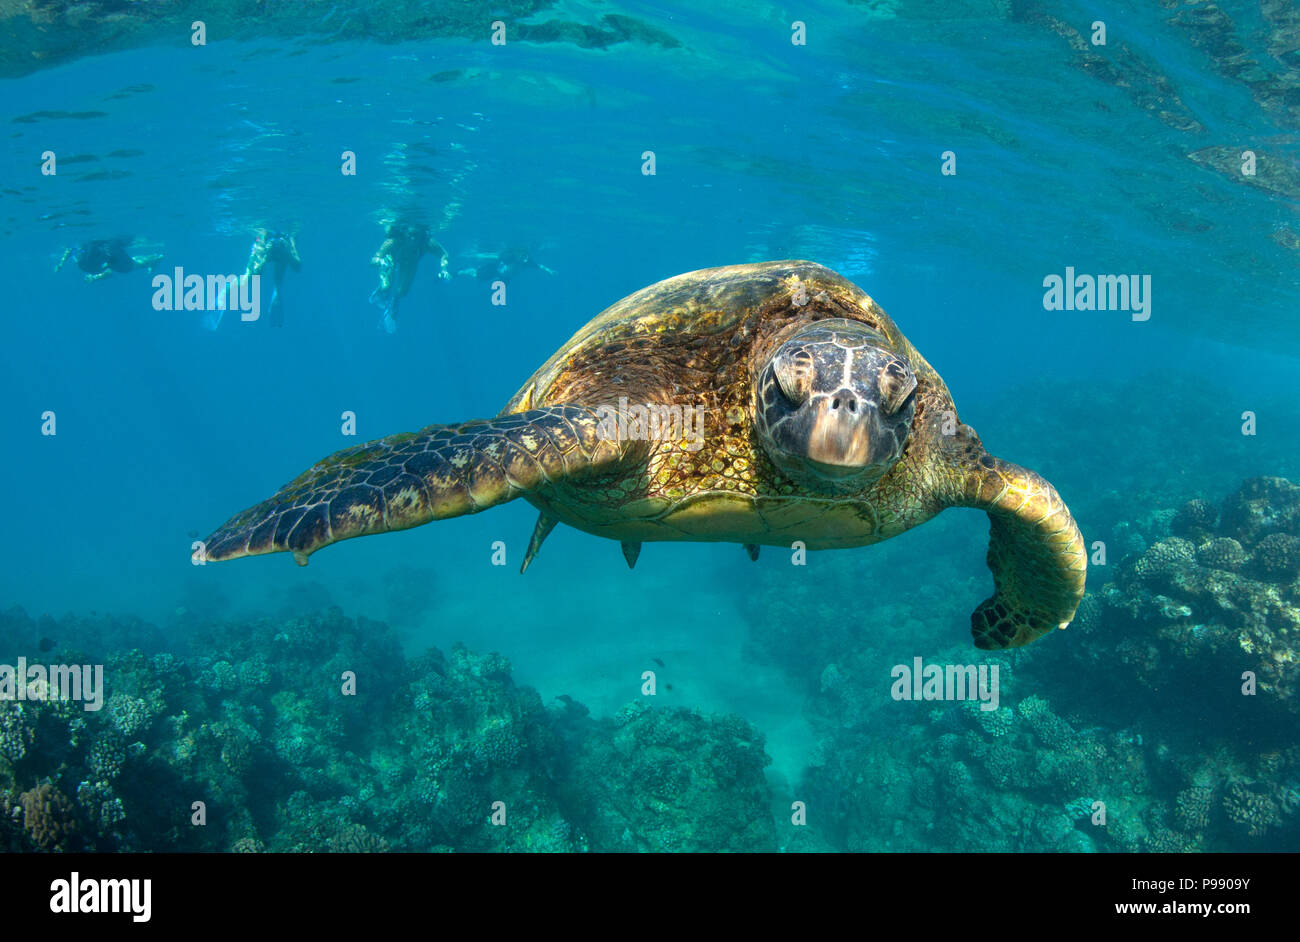 Green sea turtle encounter at Black Rock, Ka'anapali, Maui, Hawaii. - Stock Image